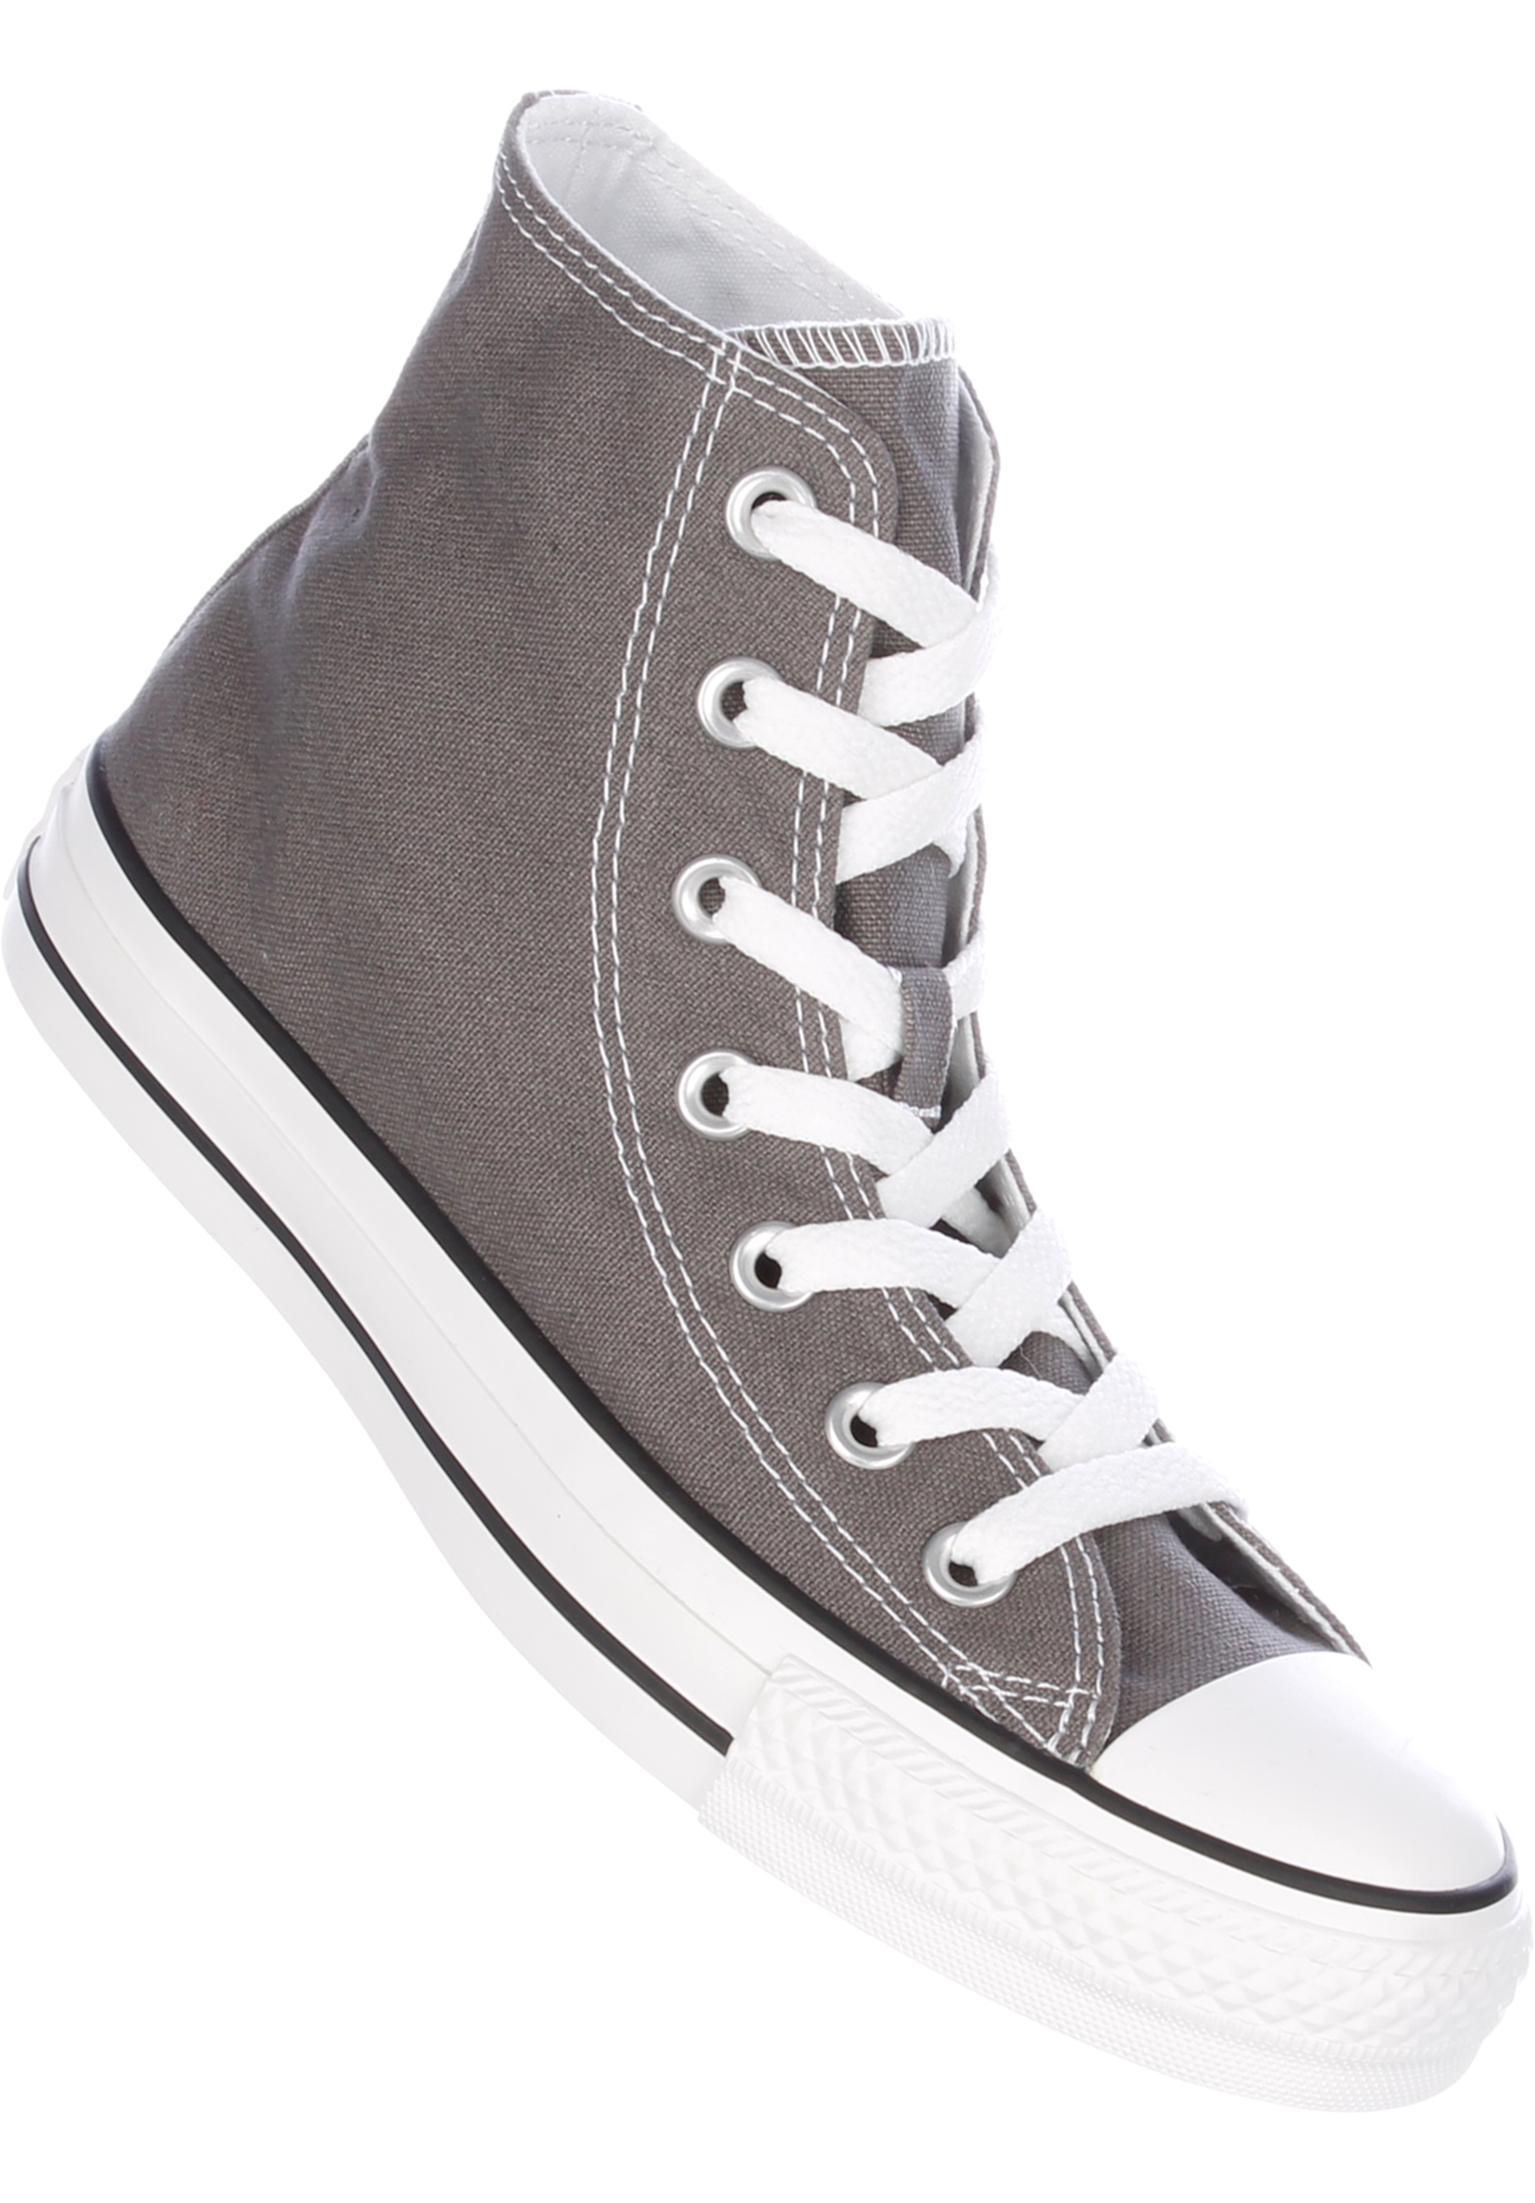 d392e7011b9b7f Chuck Taylor Allstar Hi Converse Alle Schuhe in charcoal für Herren ...